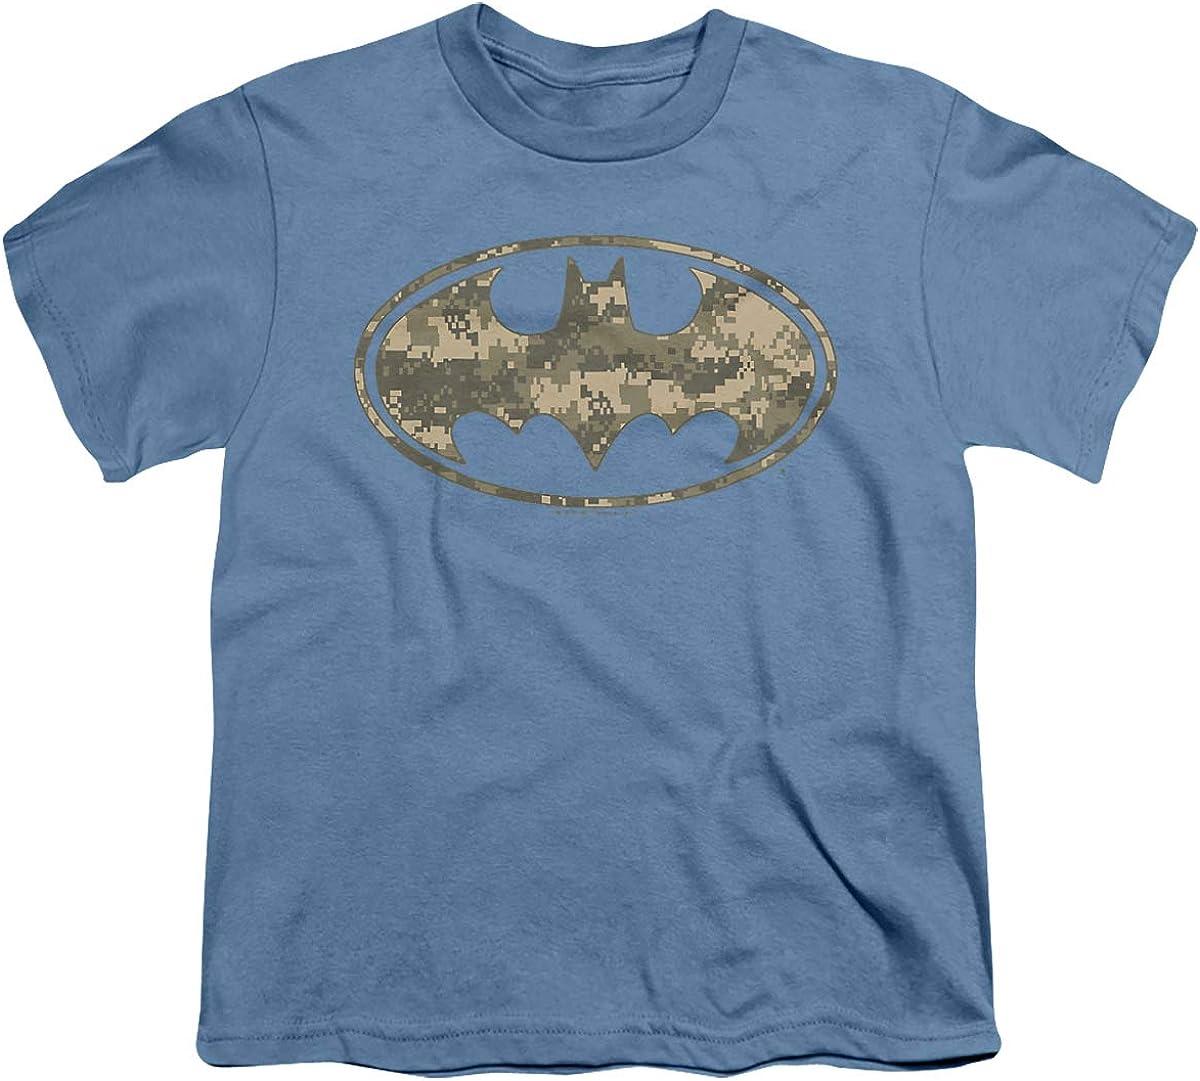 Batman Army Camo Shield Unisex Youth T Shirt